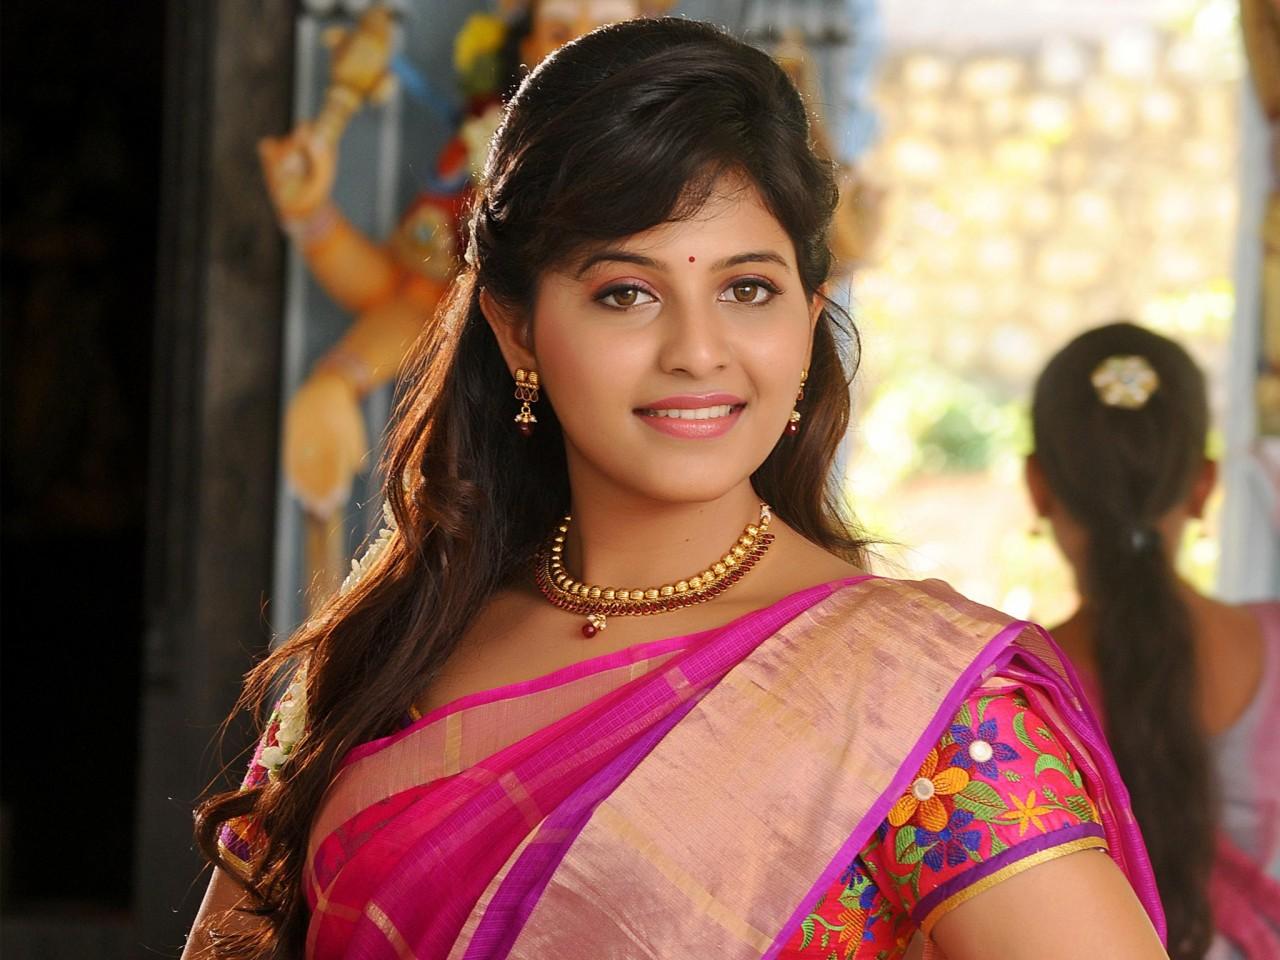 Punjabi Cute Girl Hd Wallpaper Anjali Tamil Actress Wallpapers Hd Wallpapers Id 17526